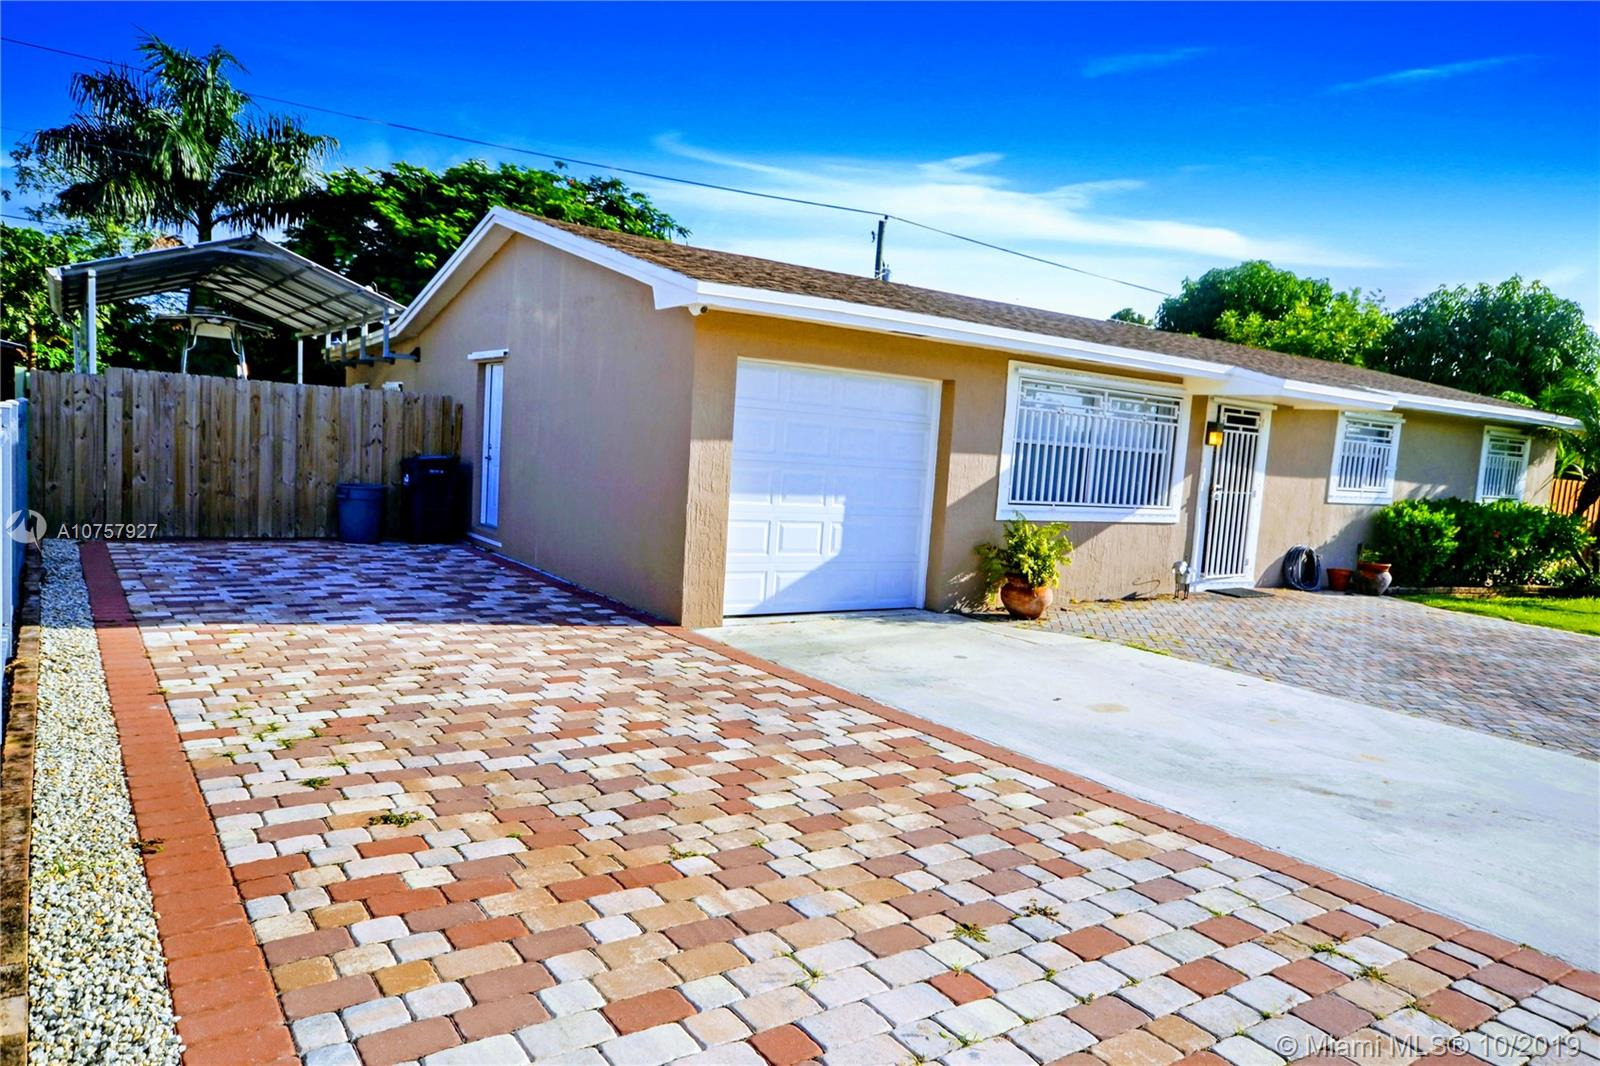 656 SW 4th Ter, Florida City, FL 33034 - Florida City, FL real estate listing